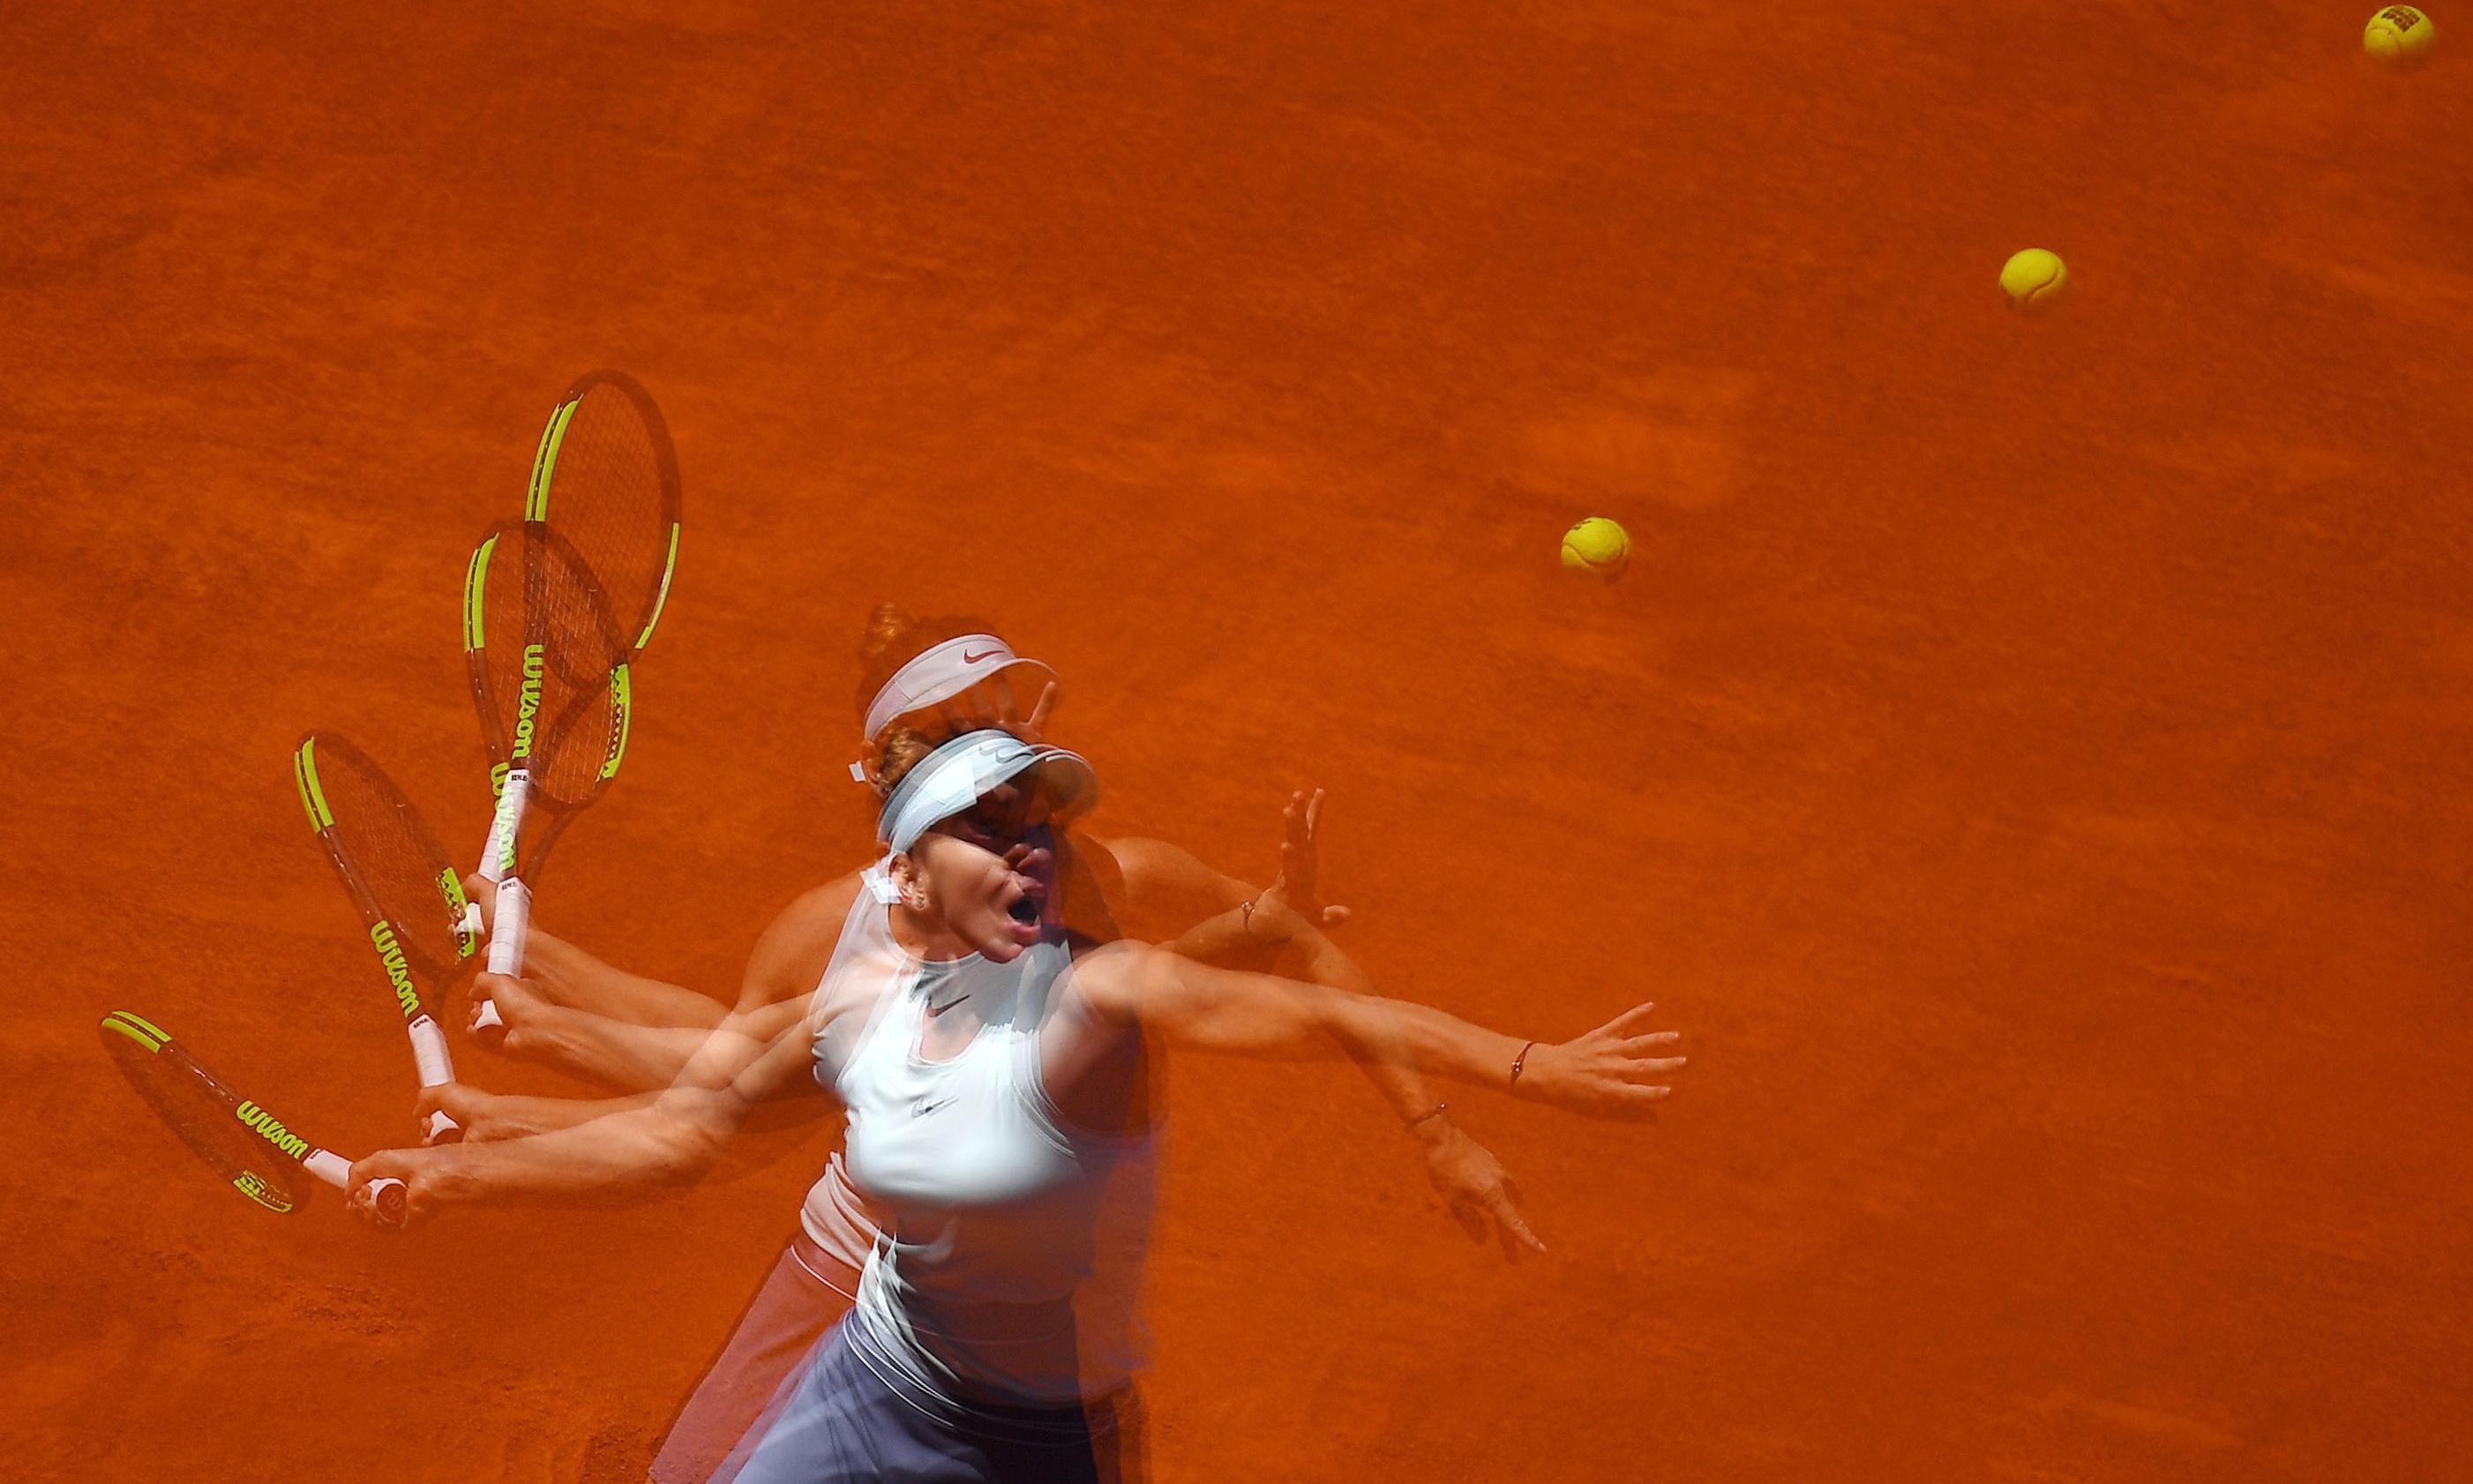 Simona Halep halts Ashleigh Barty's winning run to reach Madrid semi-final